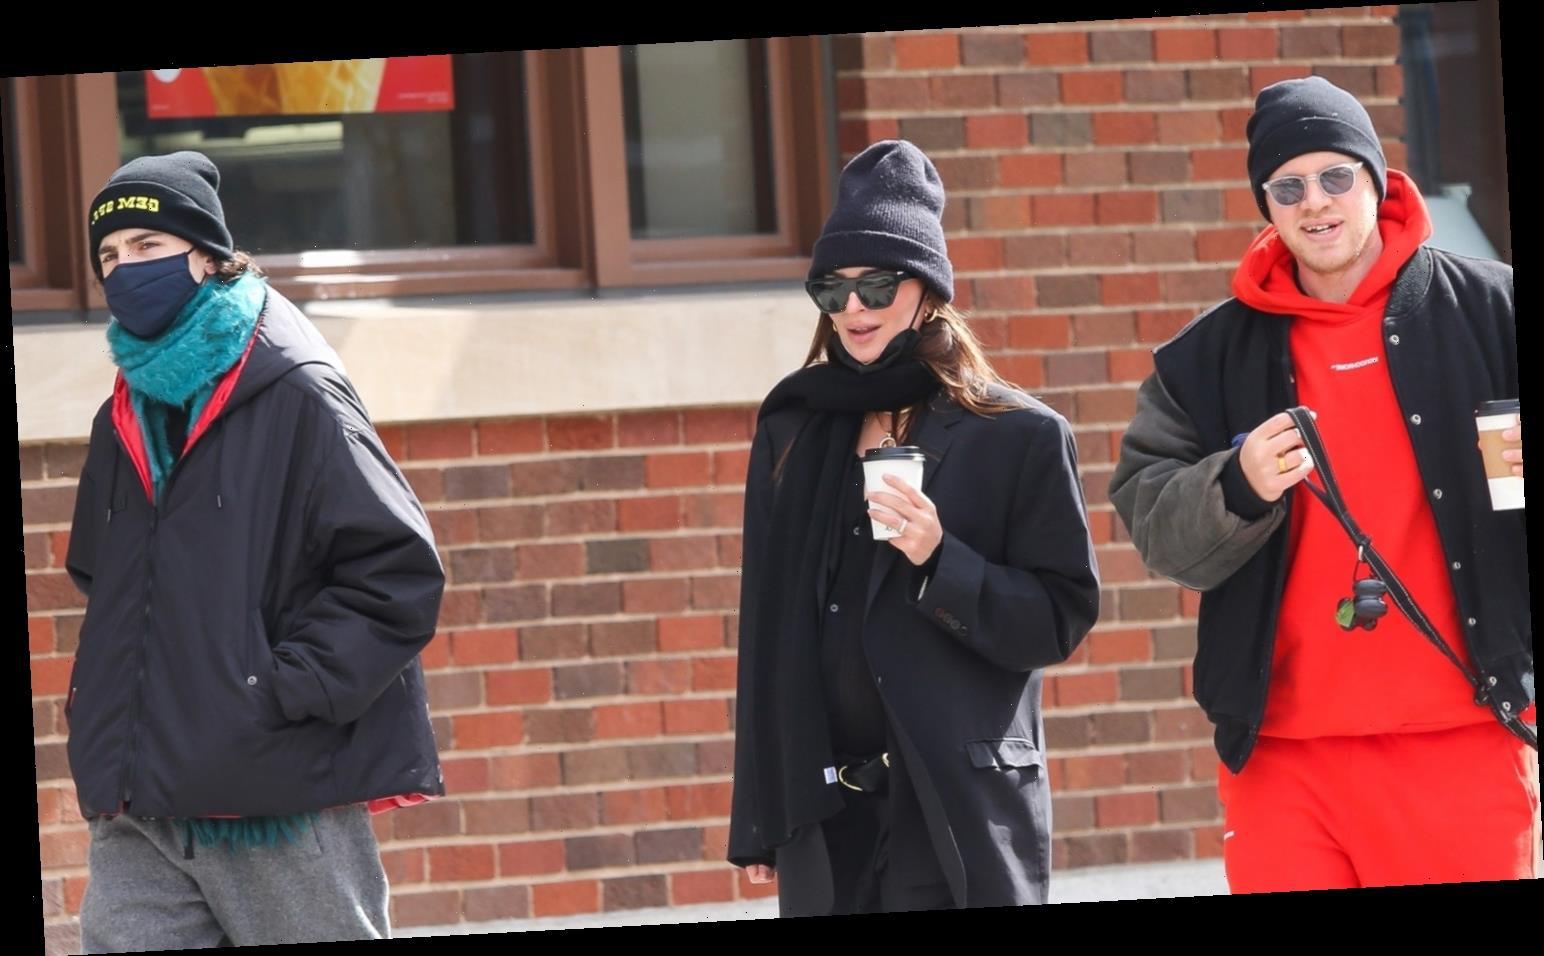 Timothee Chalamet Runs Into Emily Ratajkowski & Her Husband in New York City!